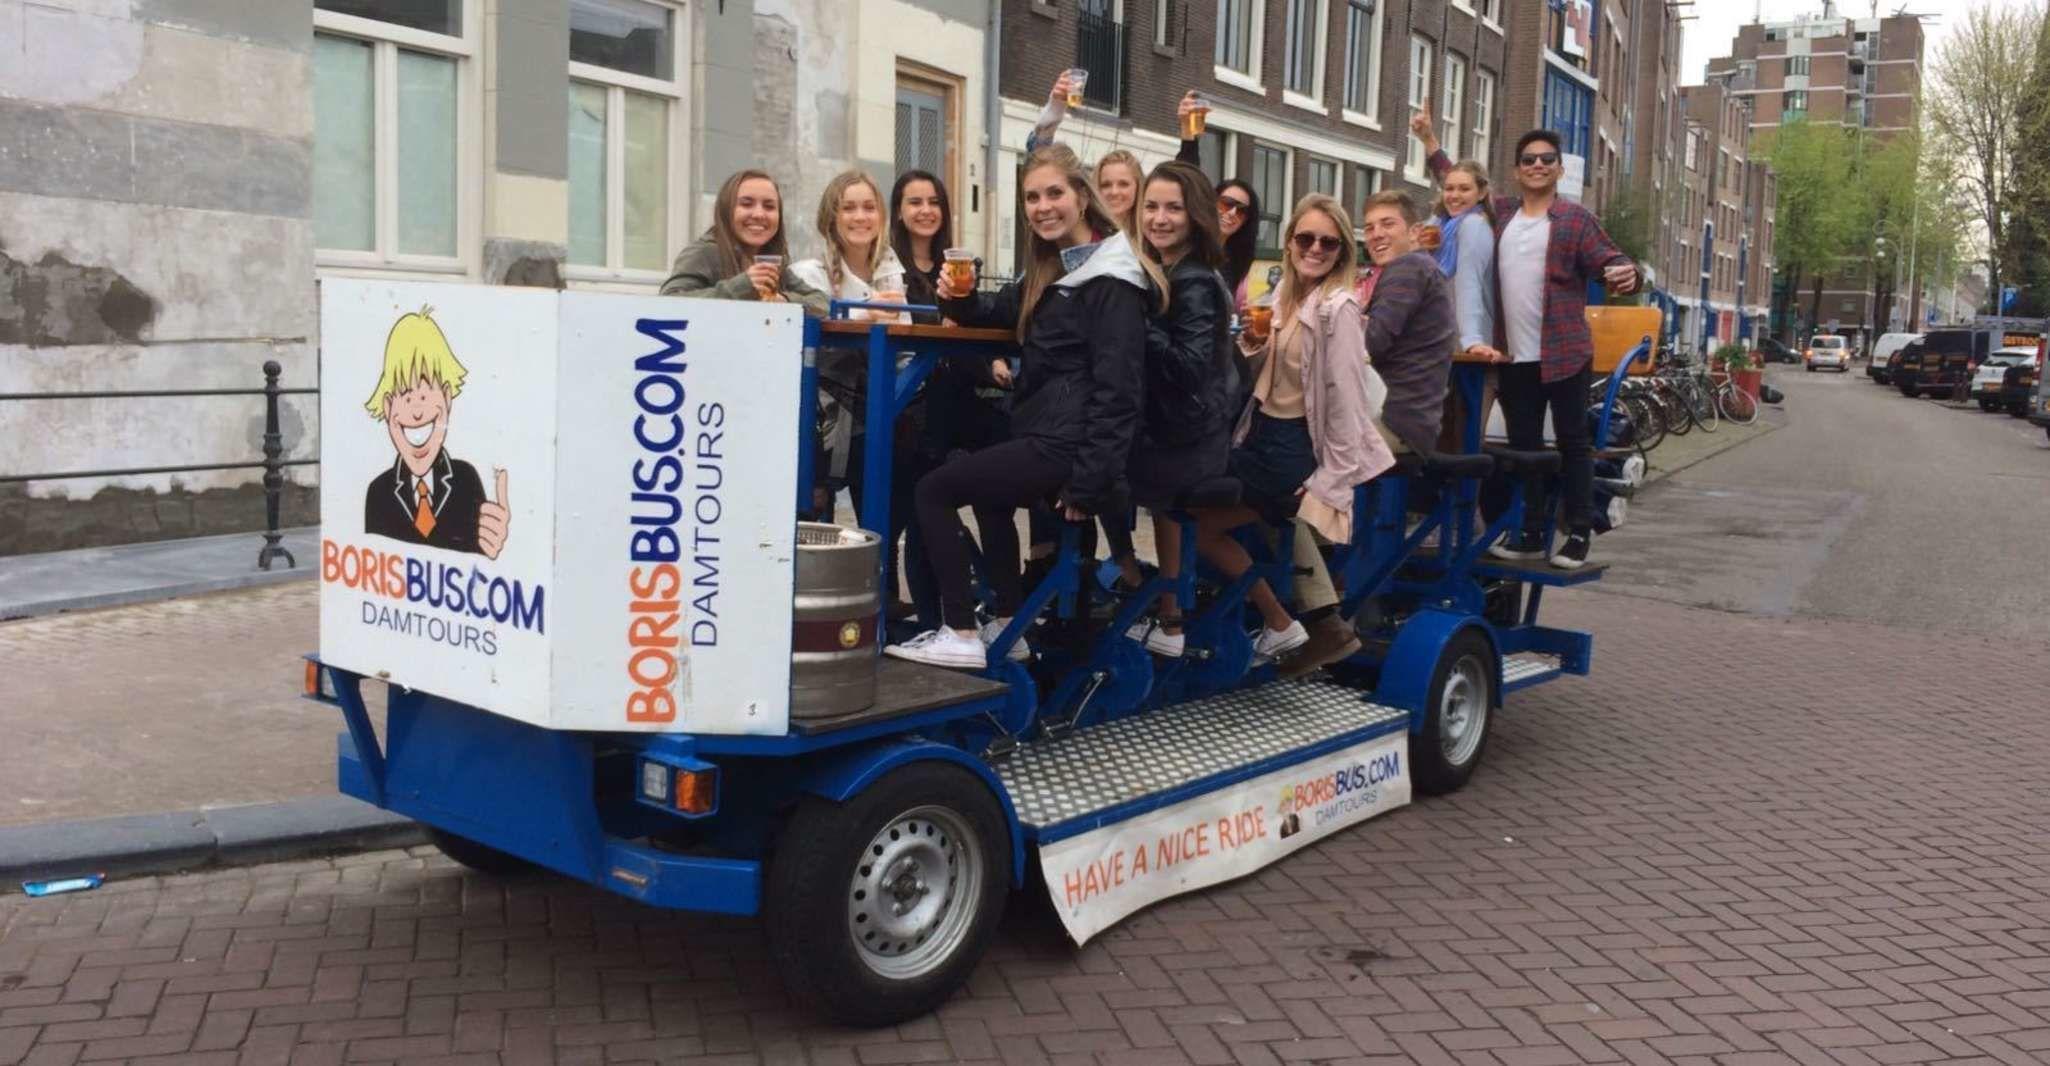 Amsterdam: Prosecco Biking Experience through the North